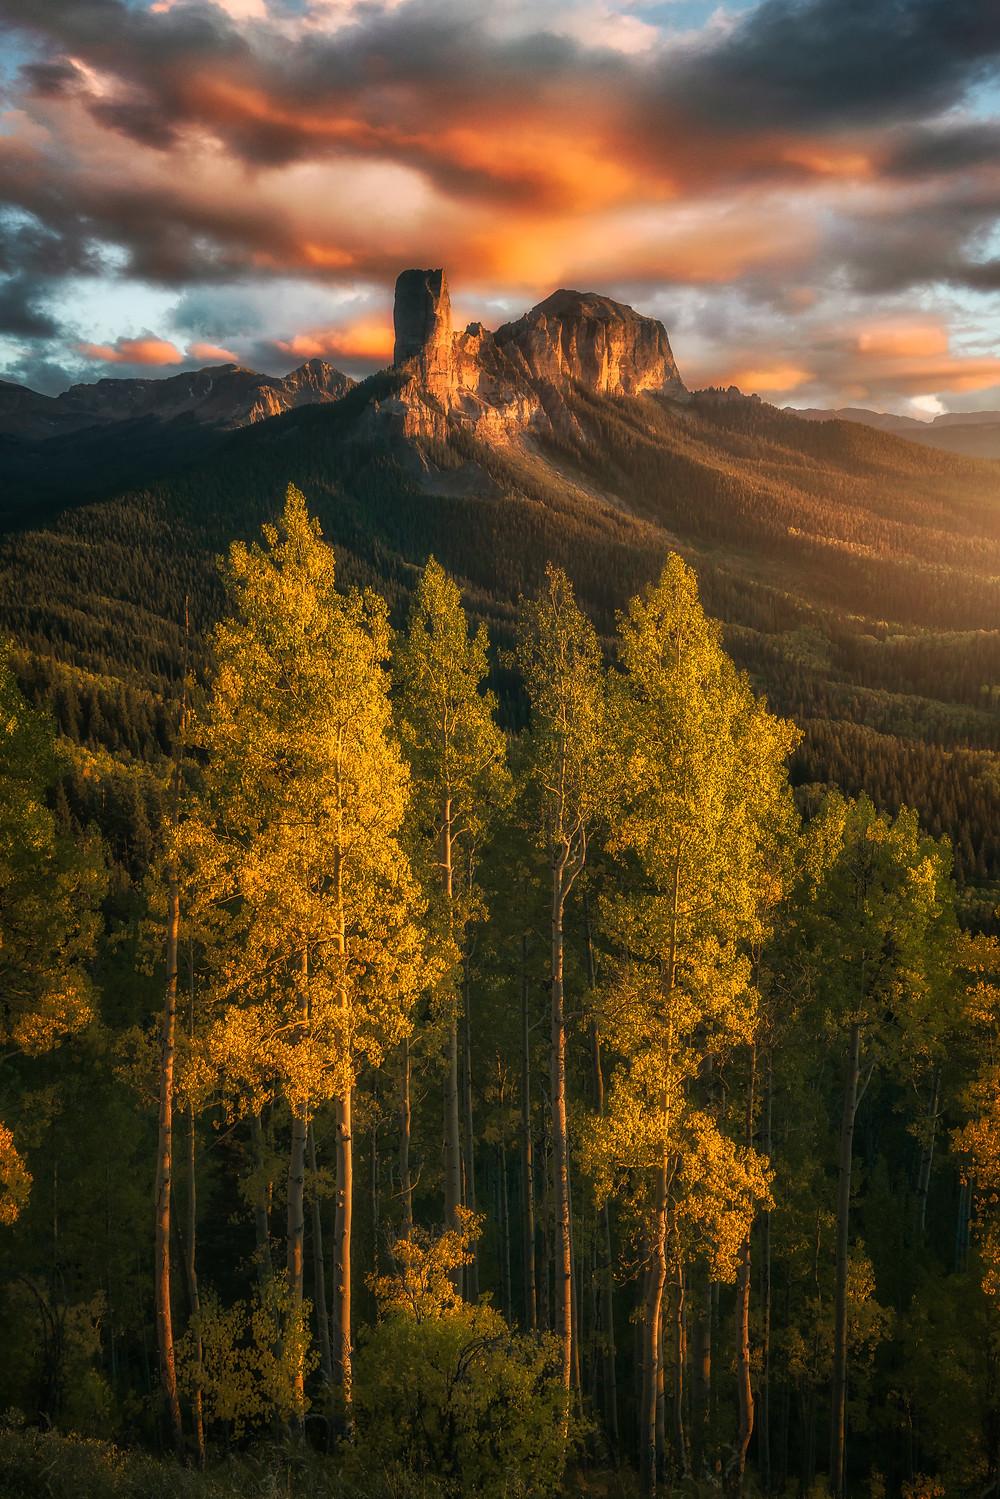 Colorado fall sunset, shot with a Samyang 35mm.